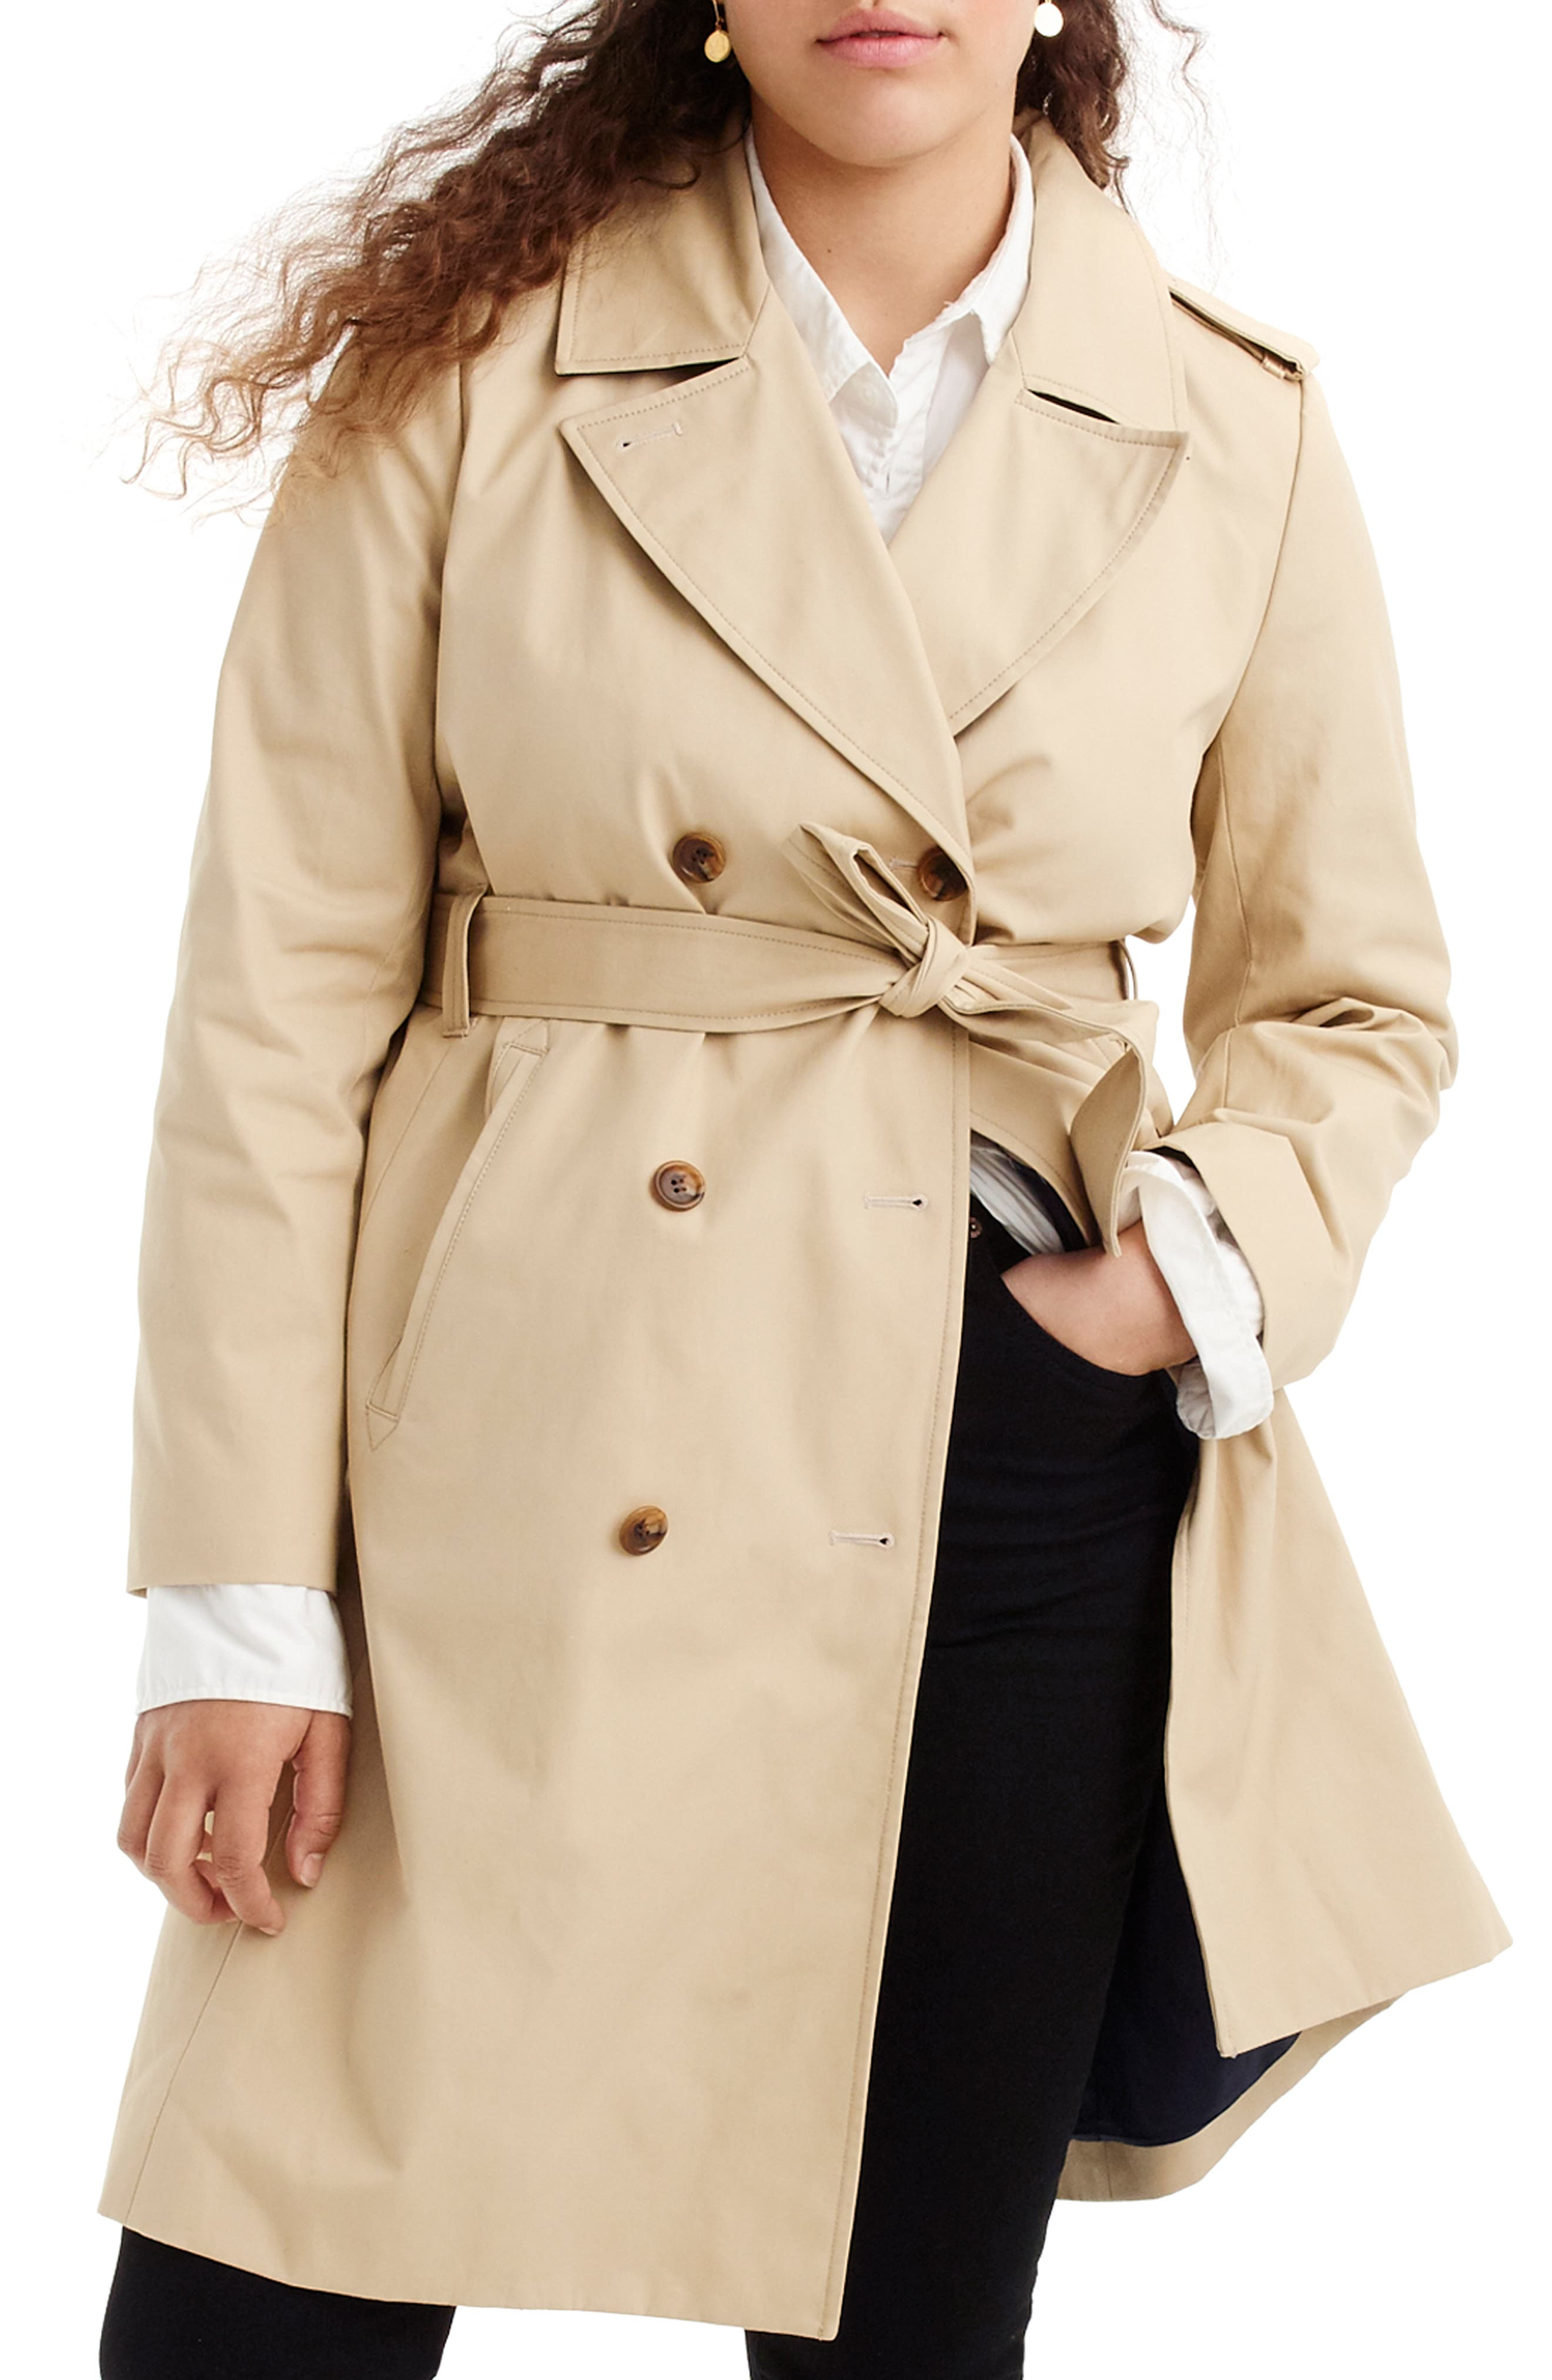 2011 Icon Trench Coat, Main, color, VINTAGE KHAKI